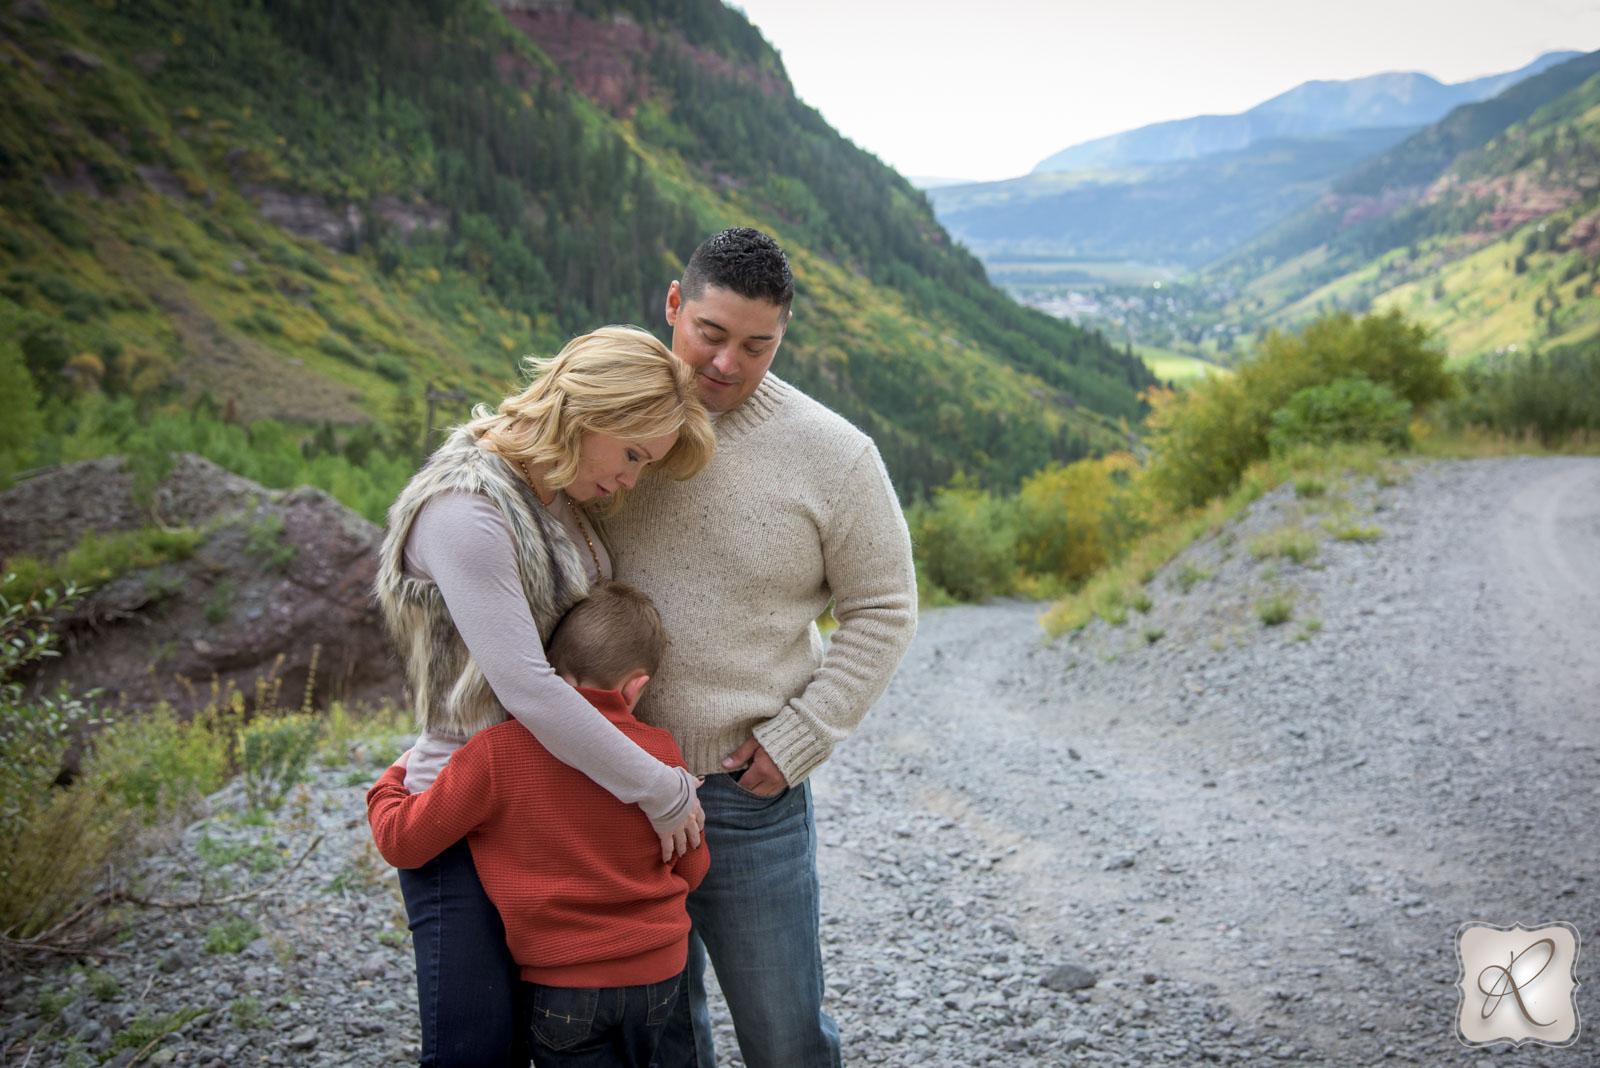 Family Pictures in Telluride Colorado